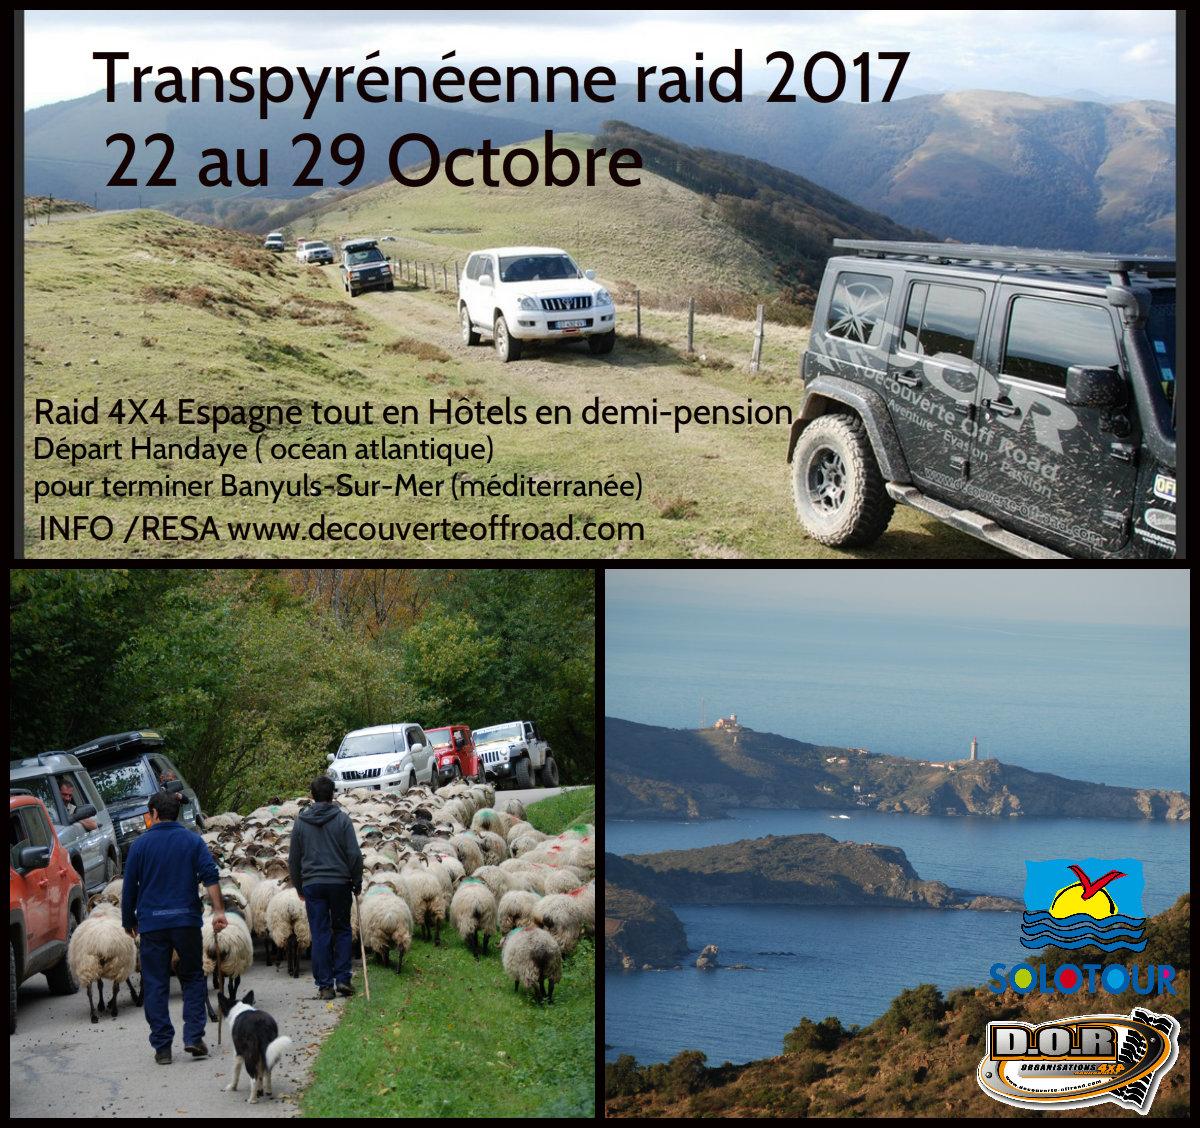 transpyreneenne 2017